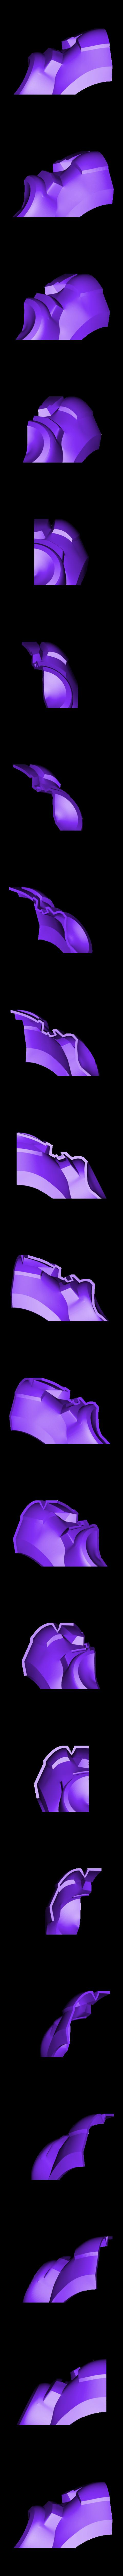 Part_3_v3.stl Download free STL file Blood Dragon Helmet Mass Effect 2 • Design to 3D print, VillainousPropShop